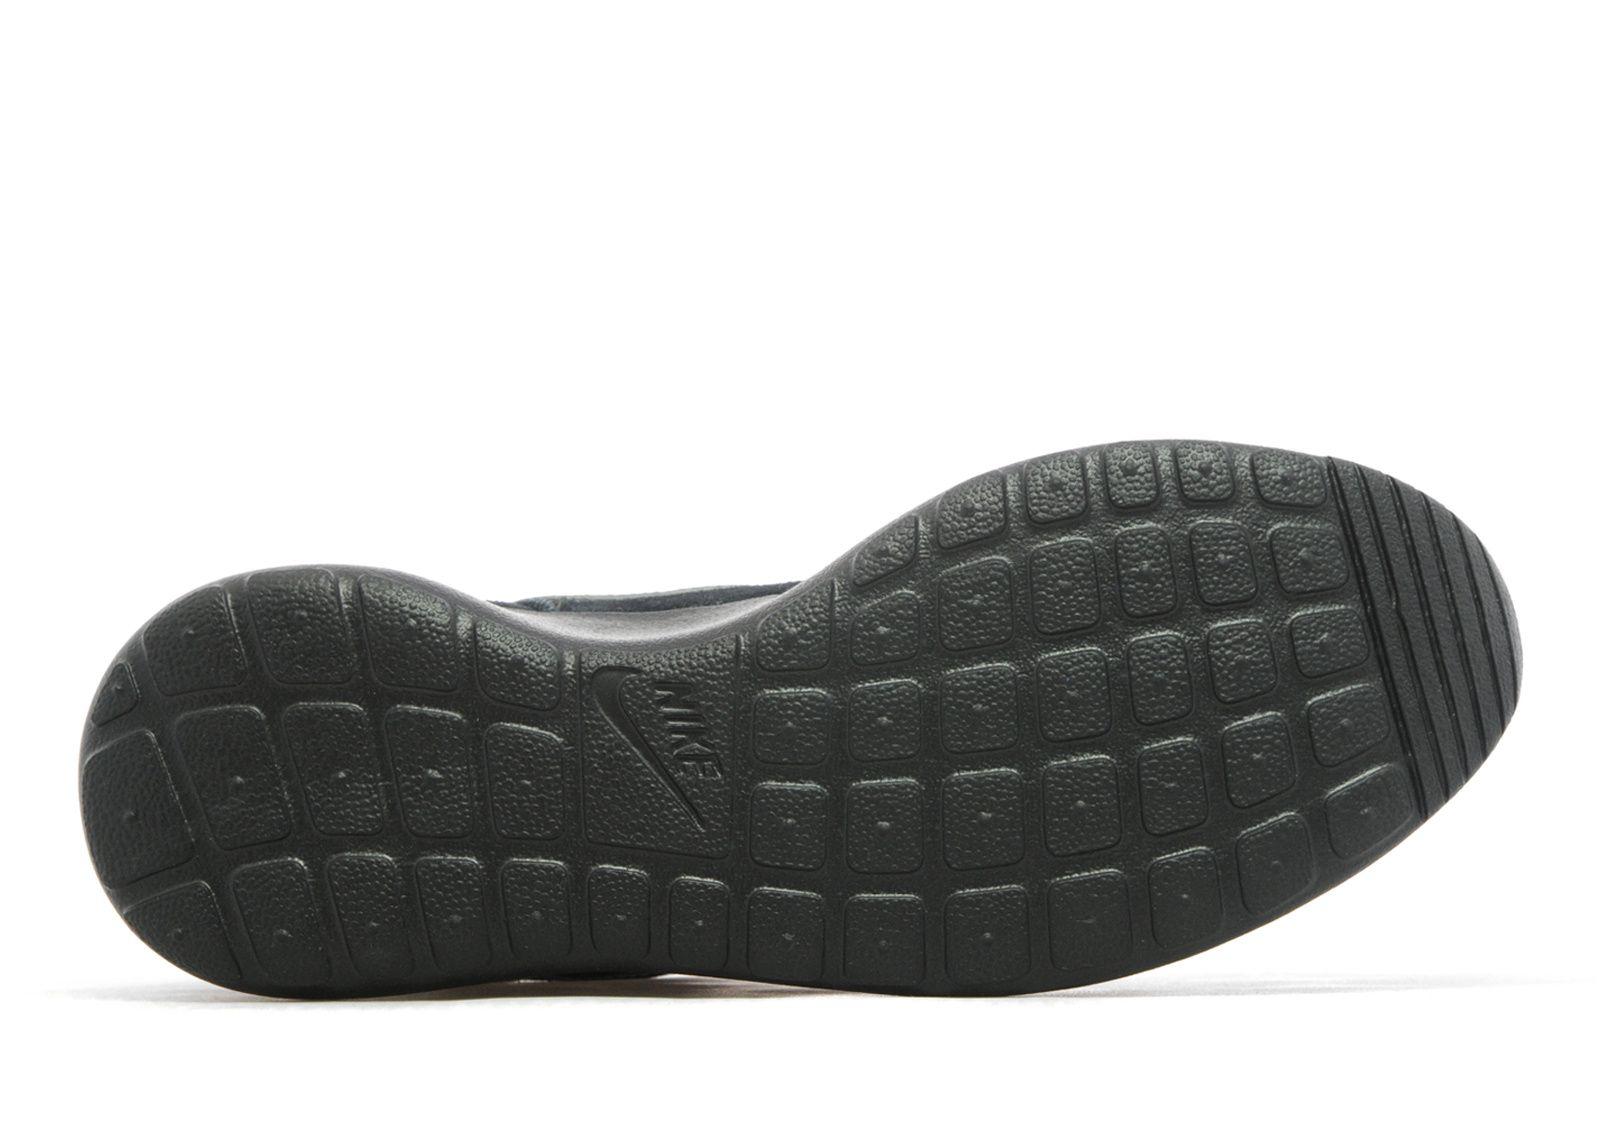 Nike Roshe Run Junior 'Reflective Pack'